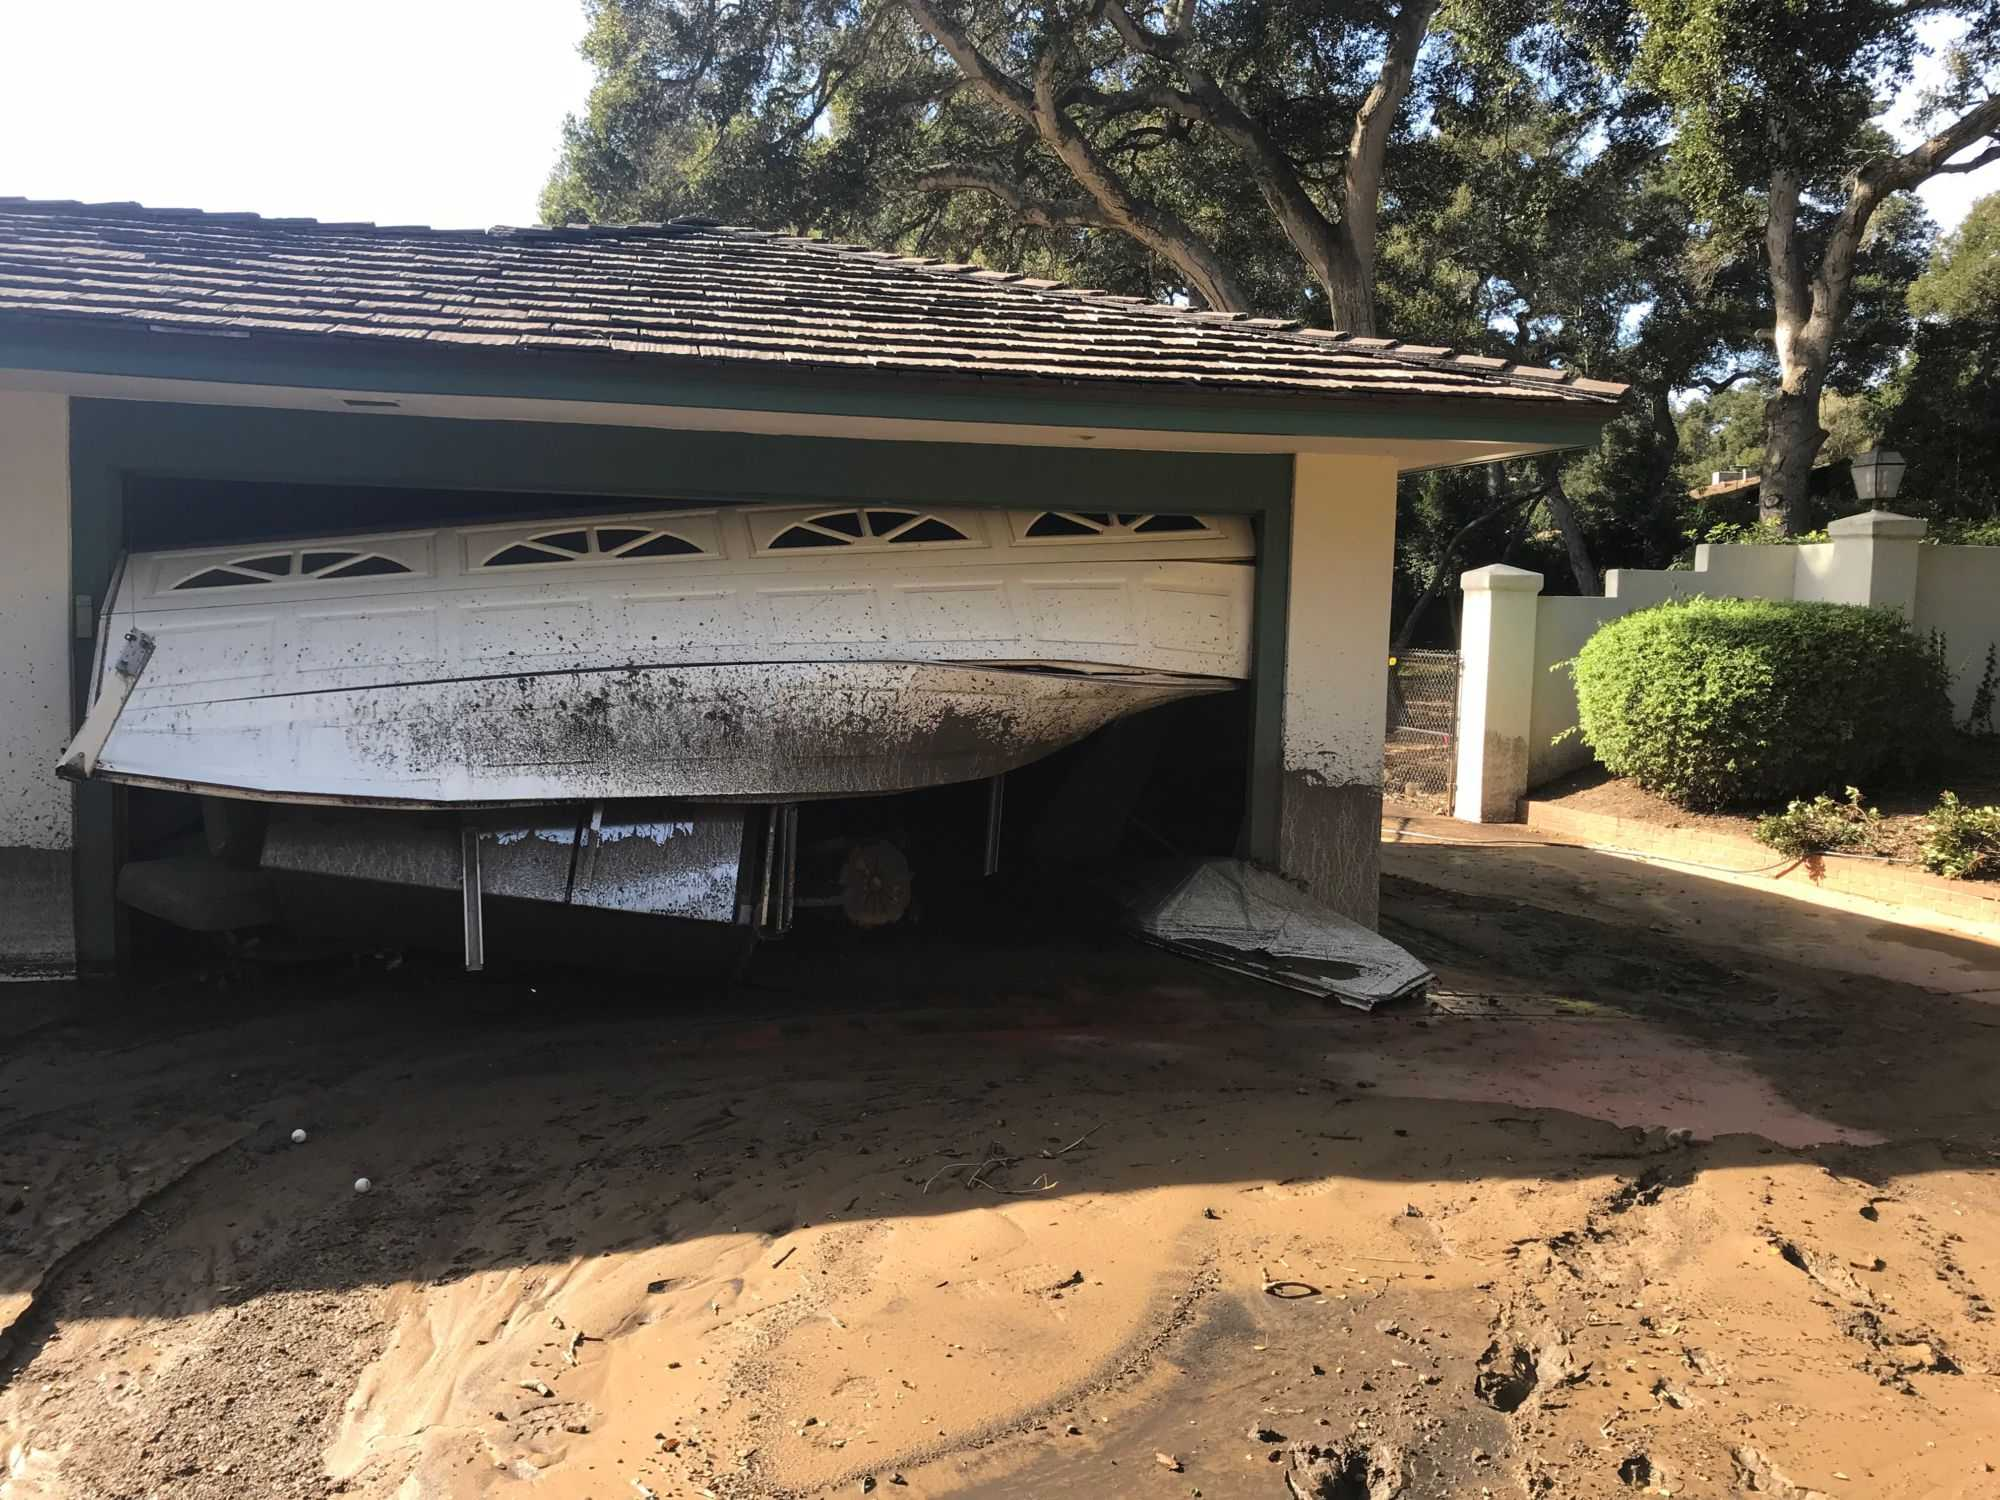 Recent mudslides impact members of Redwood community